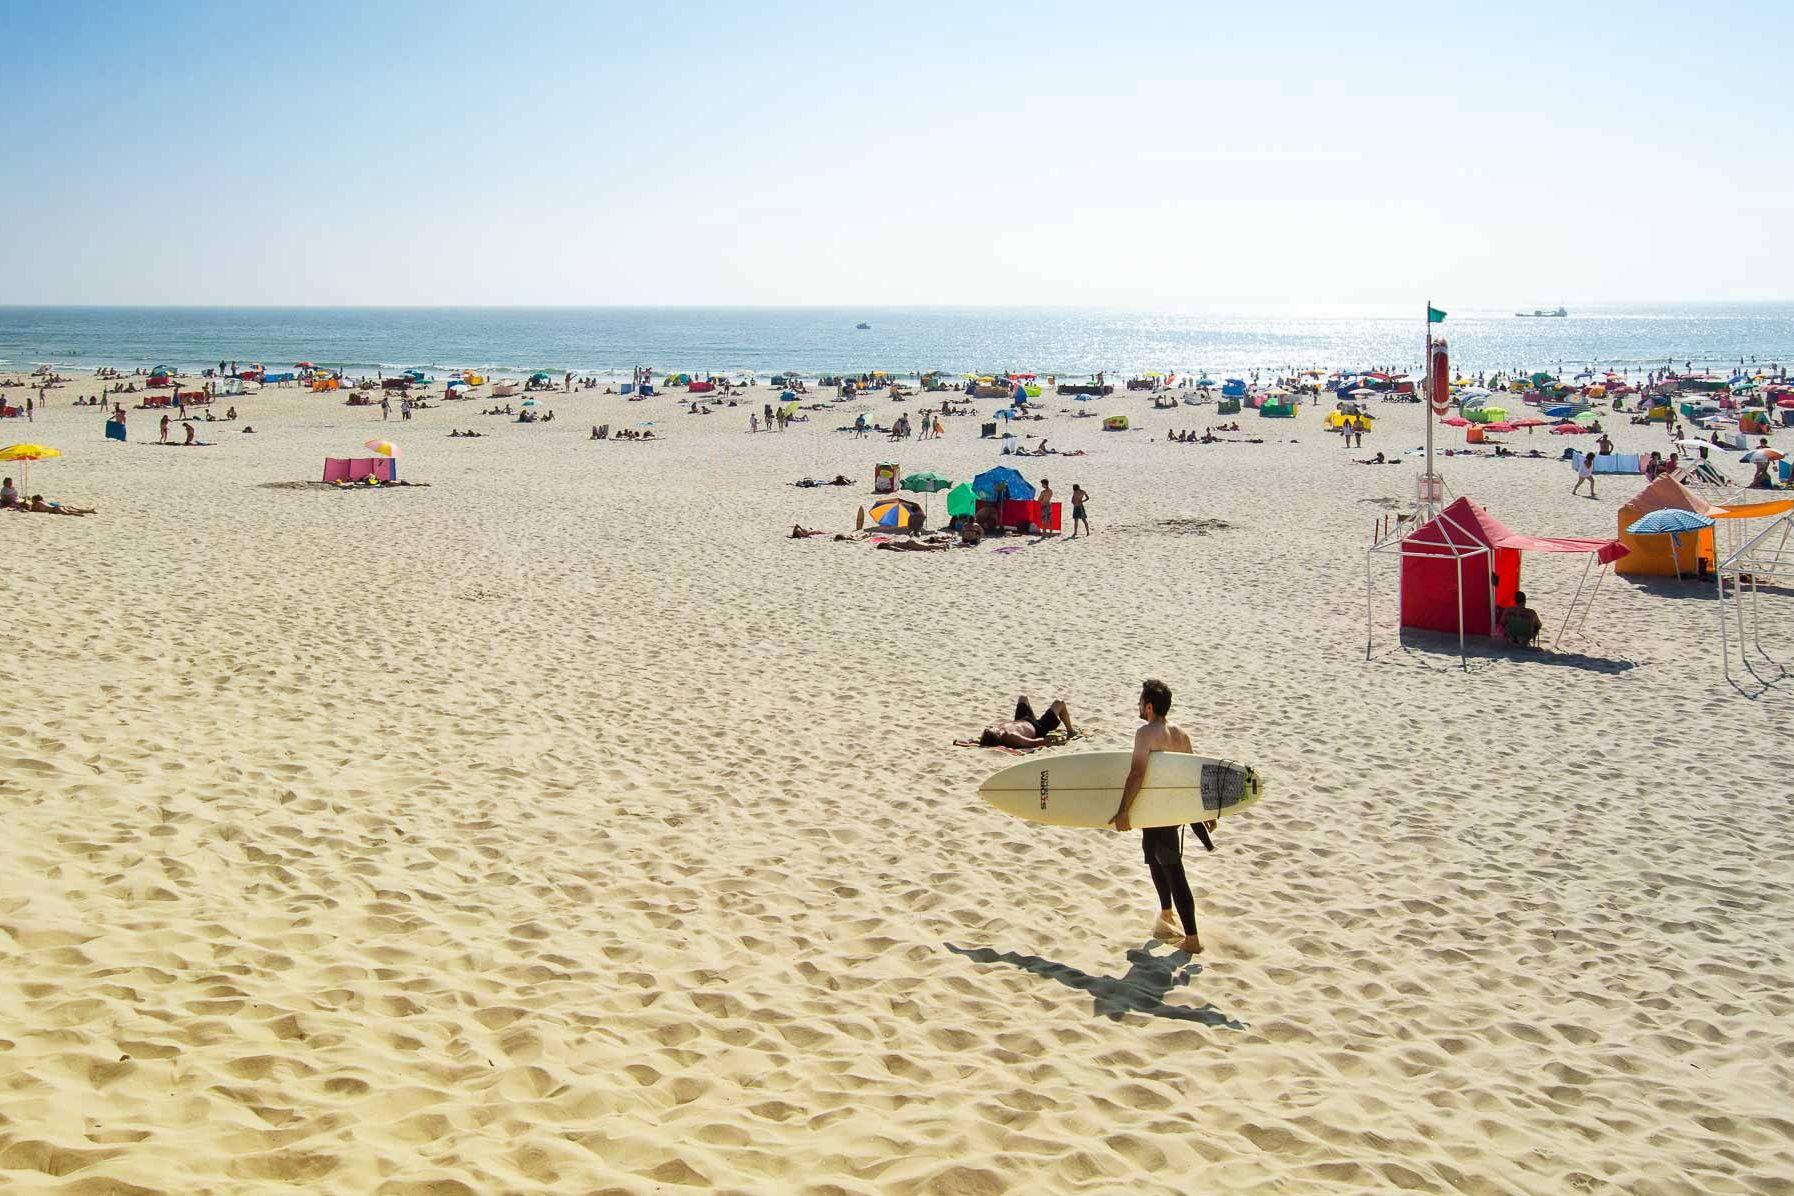 Barra beach in Aveiro